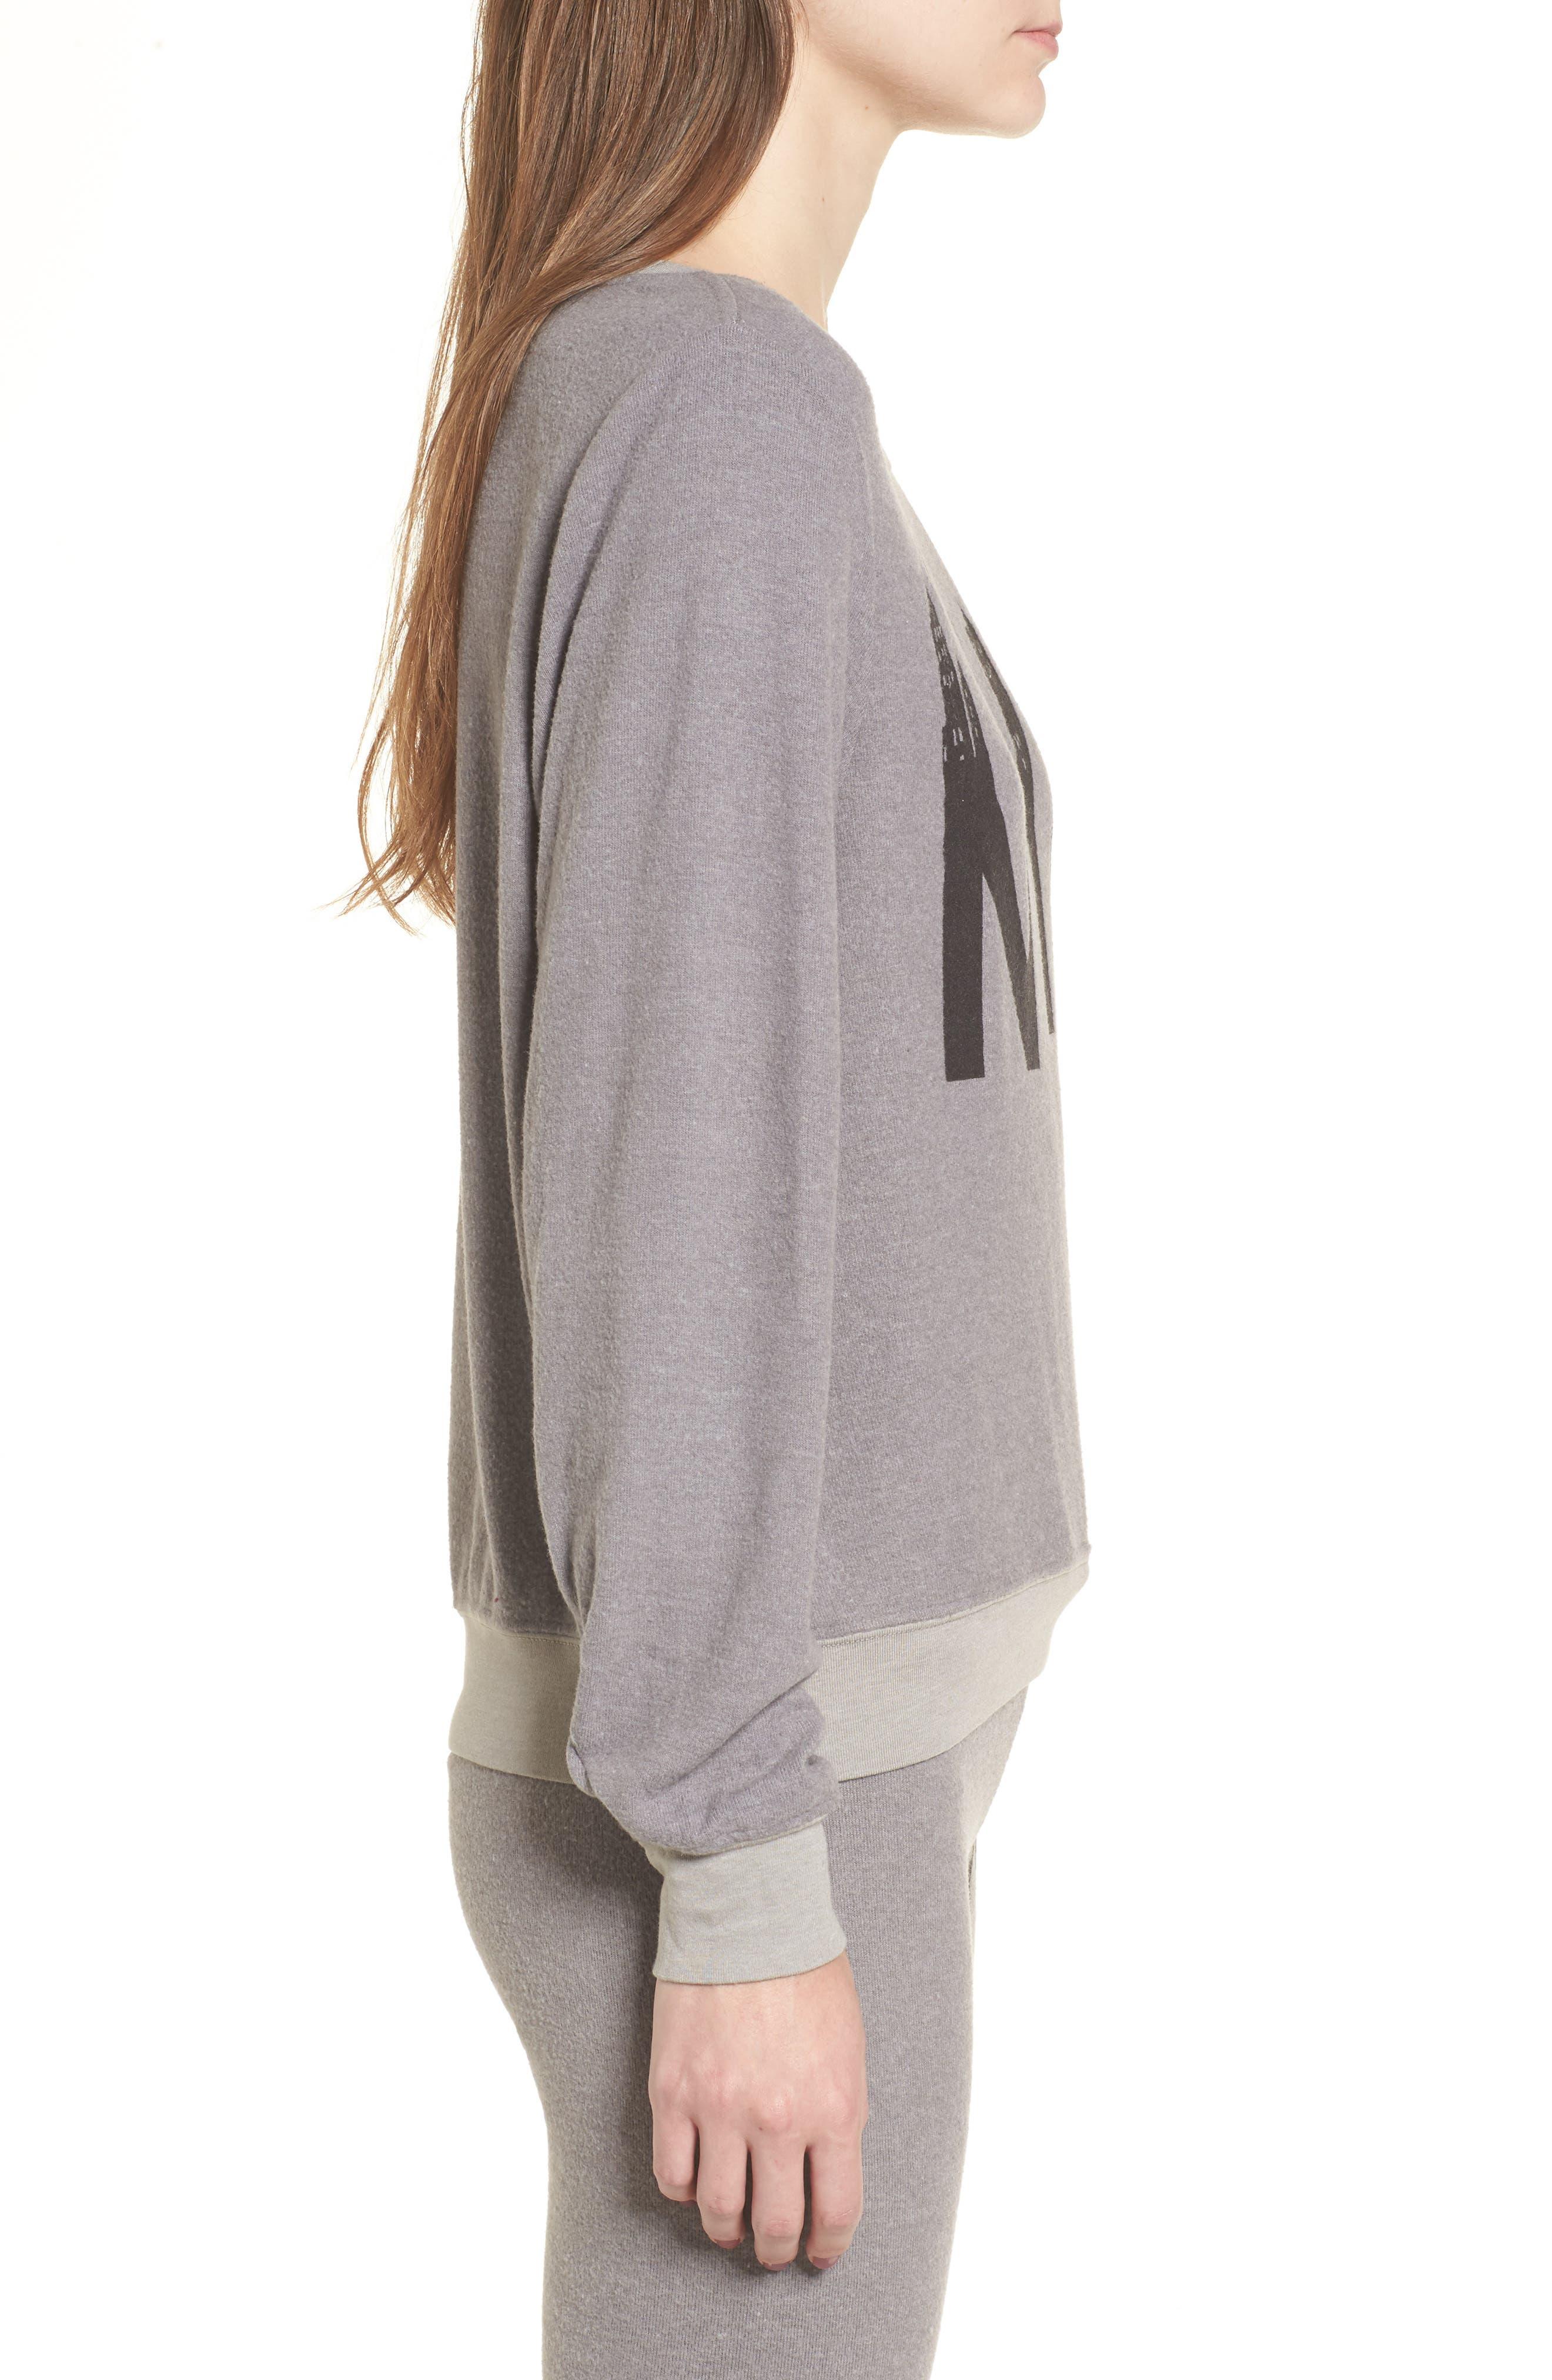 NYC Sweatshirt,                             Alternate thumbnail 3, color,                             Vintage Grey